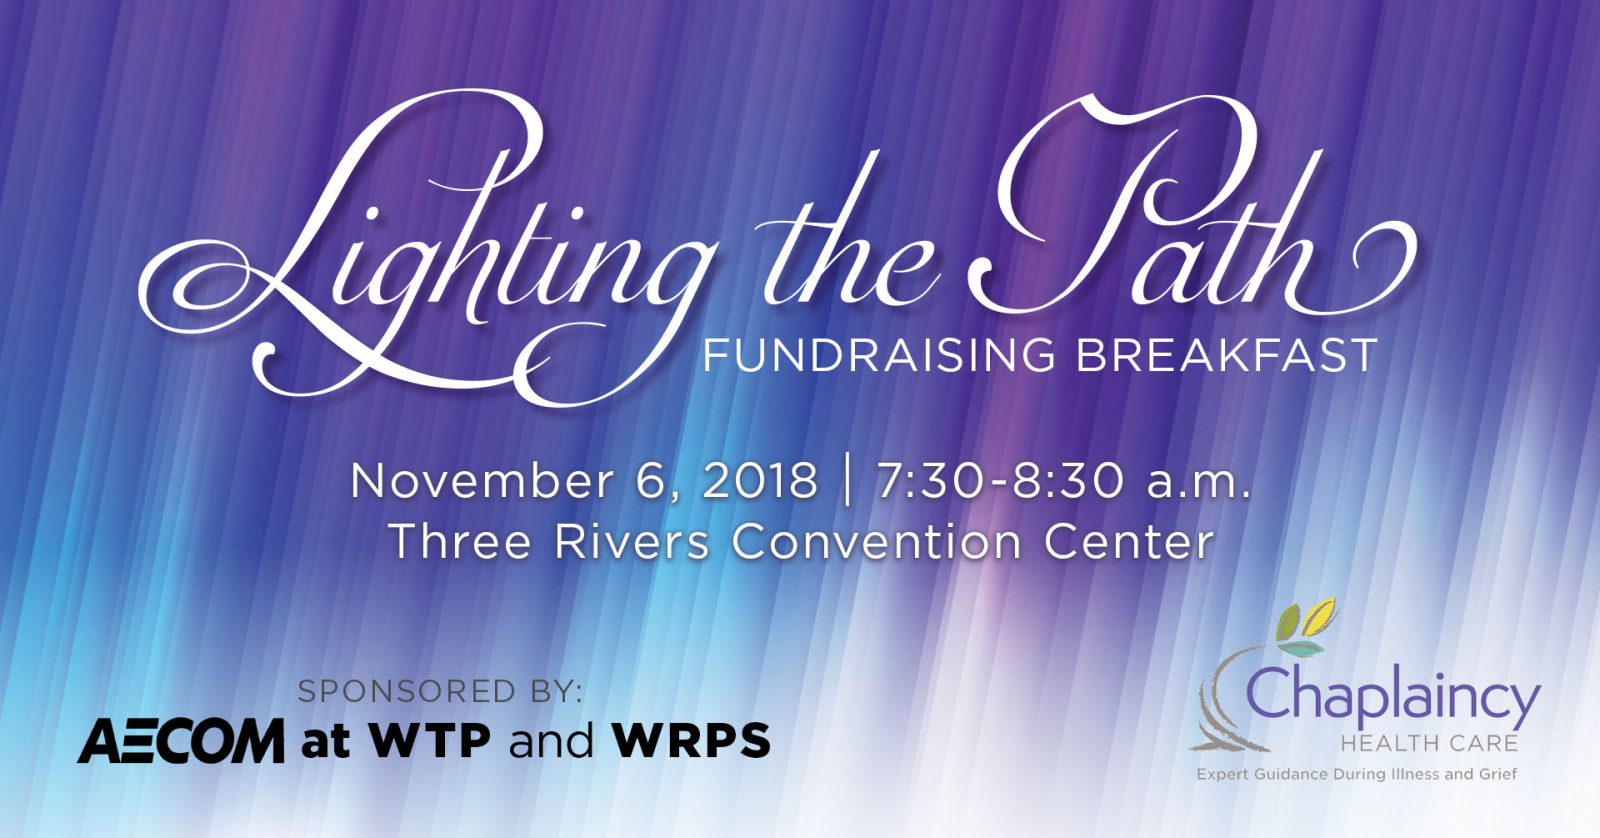 Lighting the Path Fundraising Breakfast